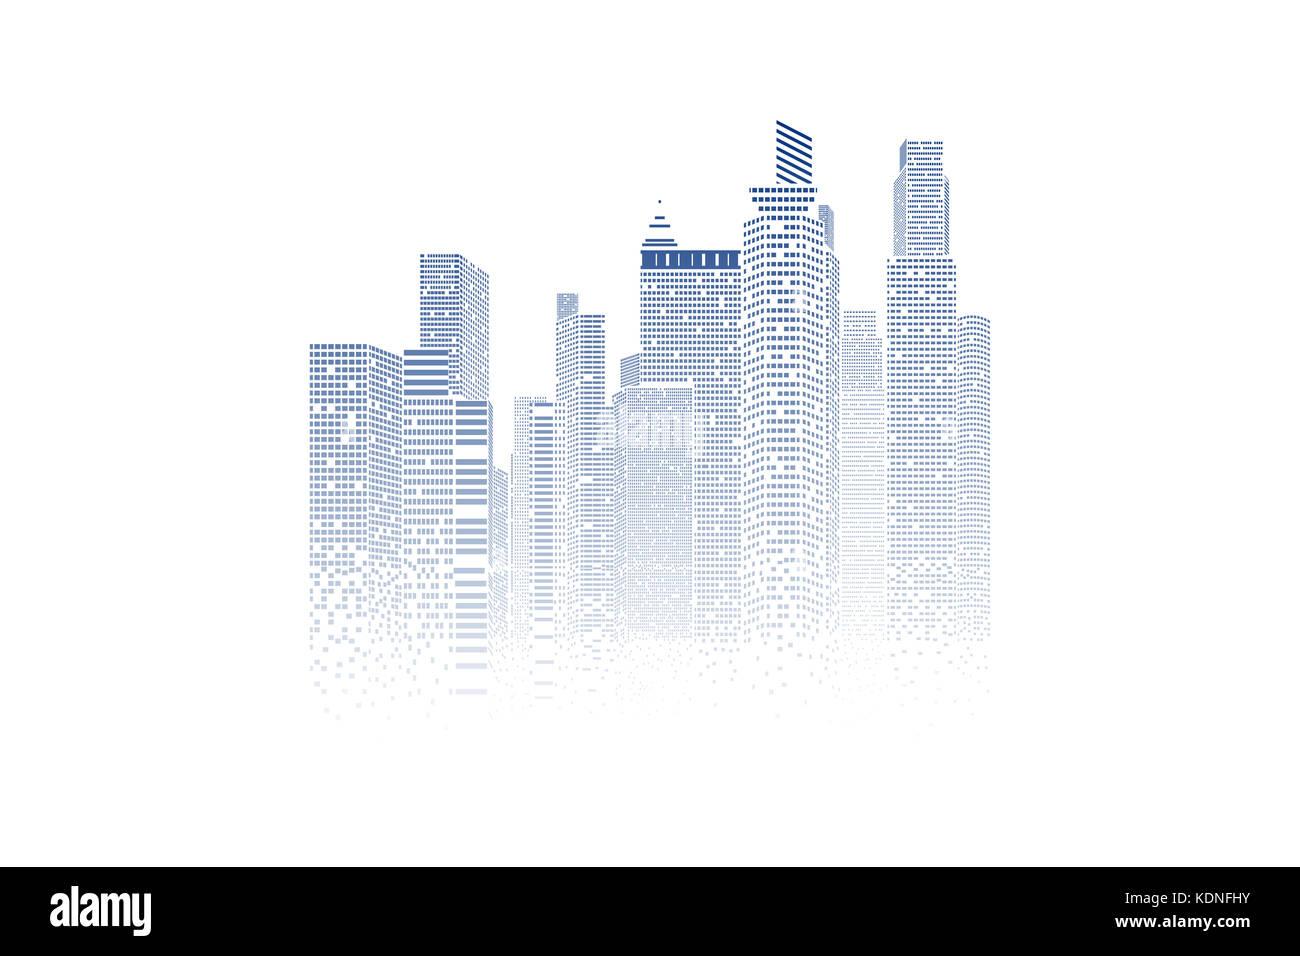 Building and City Illustration, City scene on white background - Stock Image